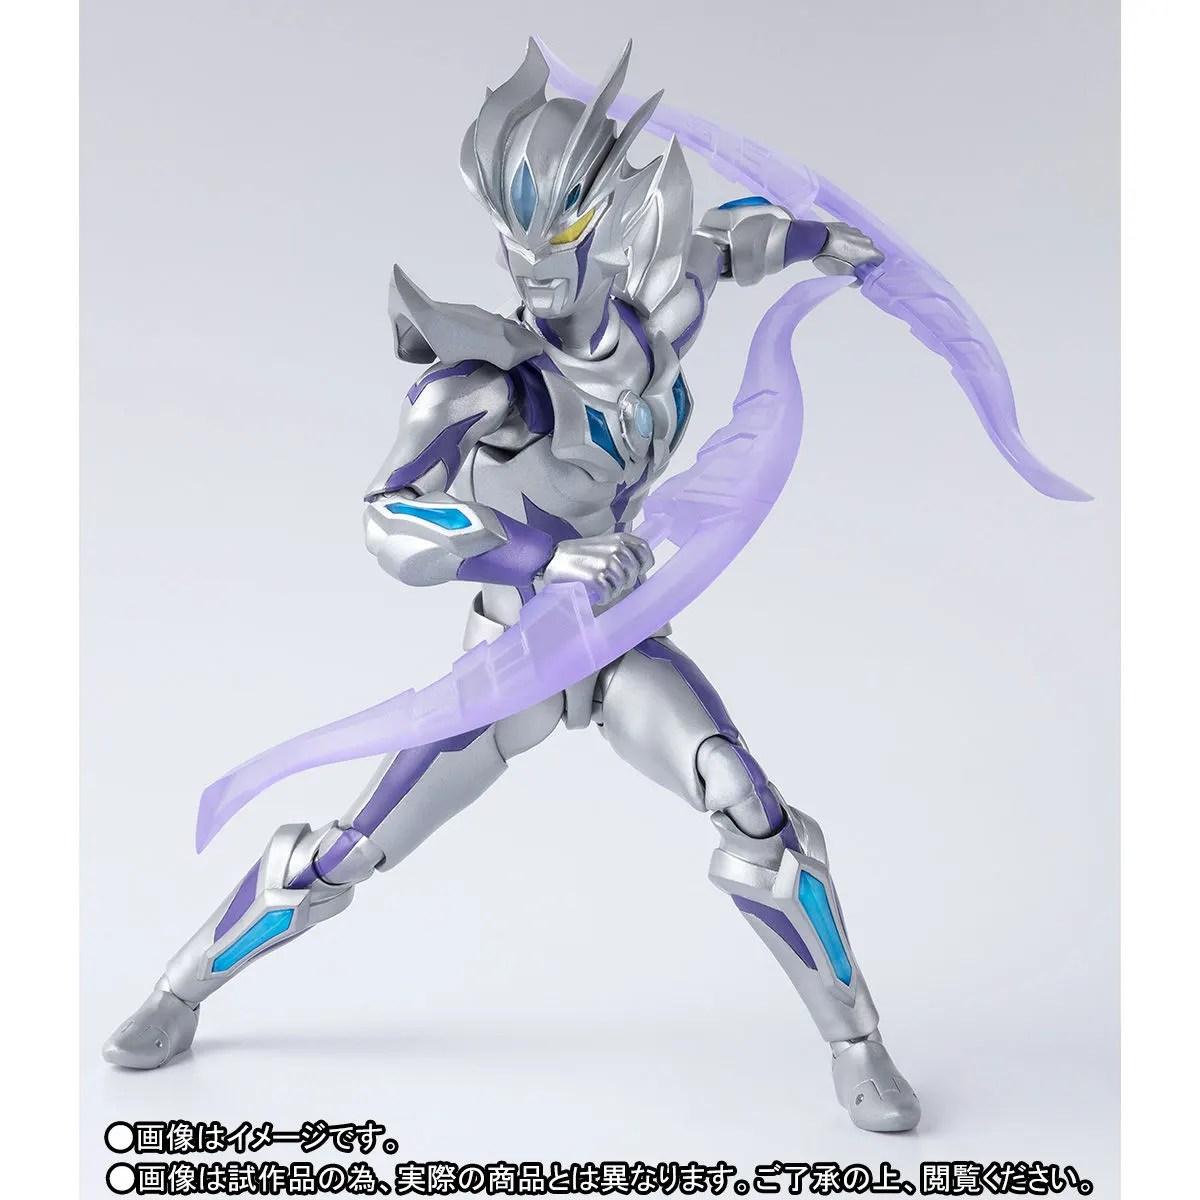 SHFiguarts Ultraman Geed Ultraman Zero Beyond